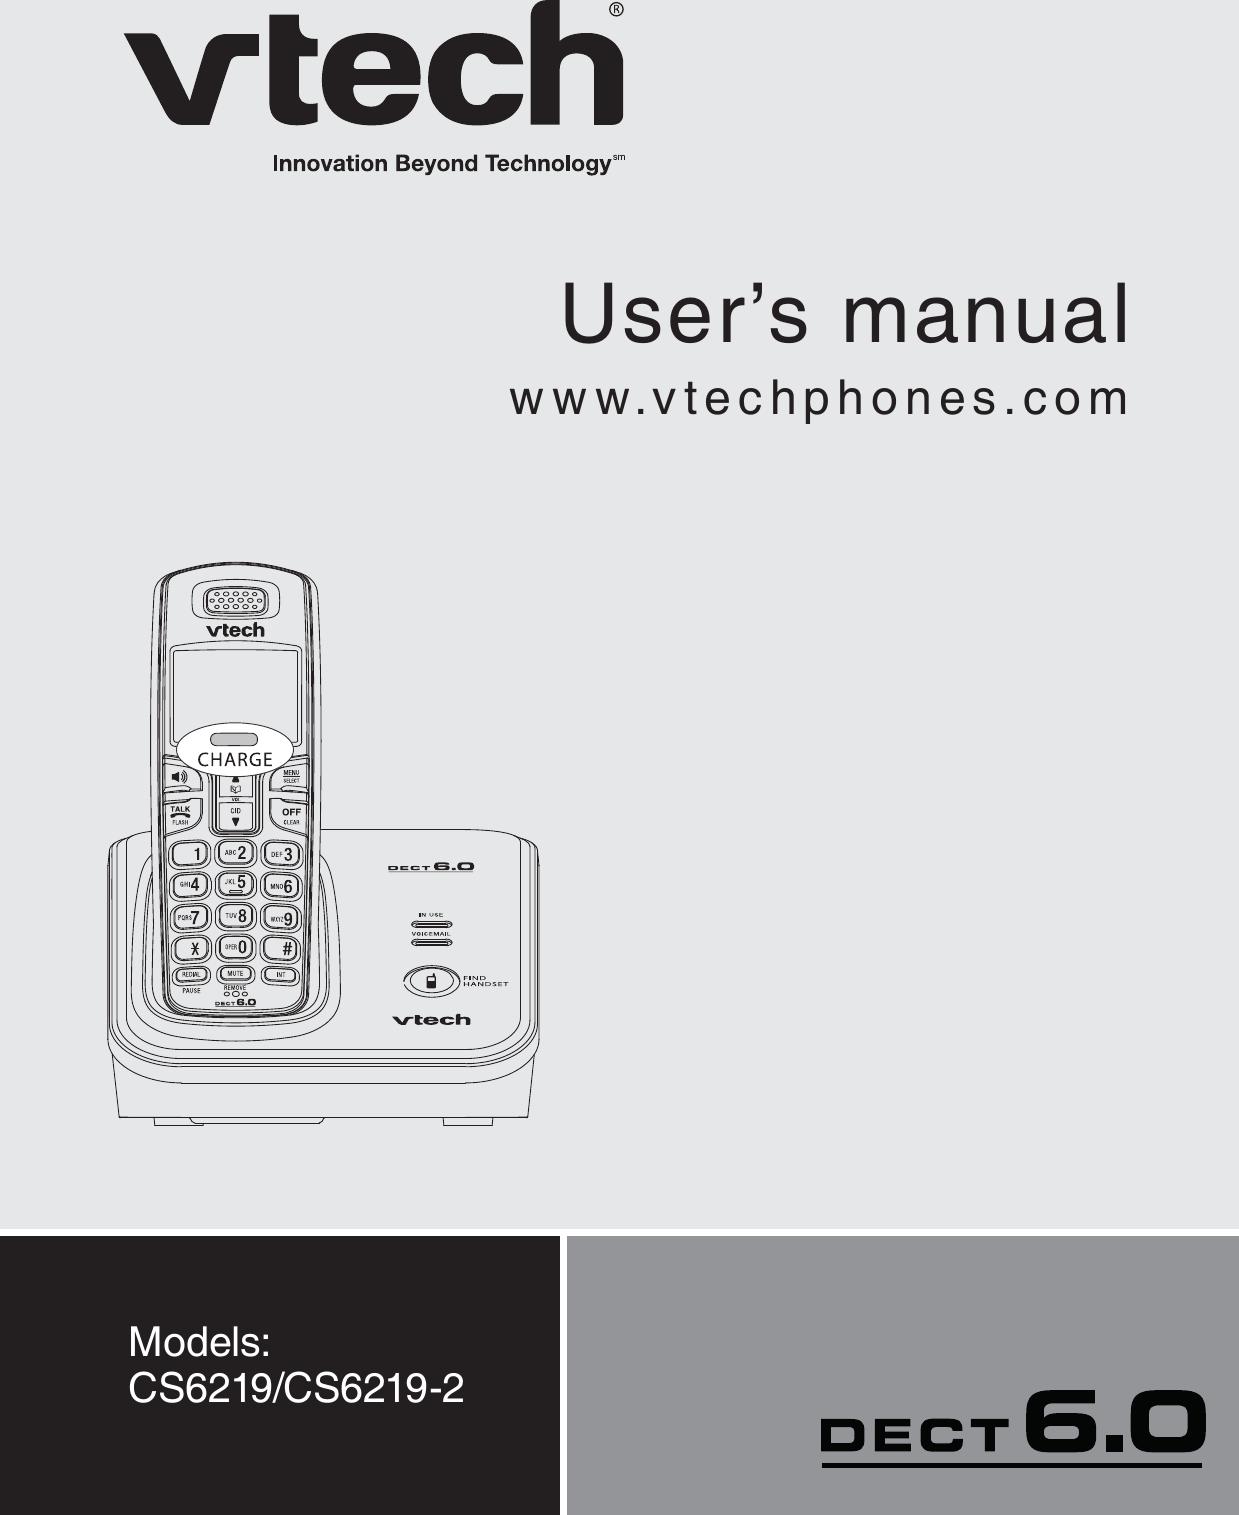 vtech telecommunications 80 6948 00 1 9ghz cordless phone handset rh usermanual wiki vtech user's manual dect 6.0 vtech user's manual dect 6.0